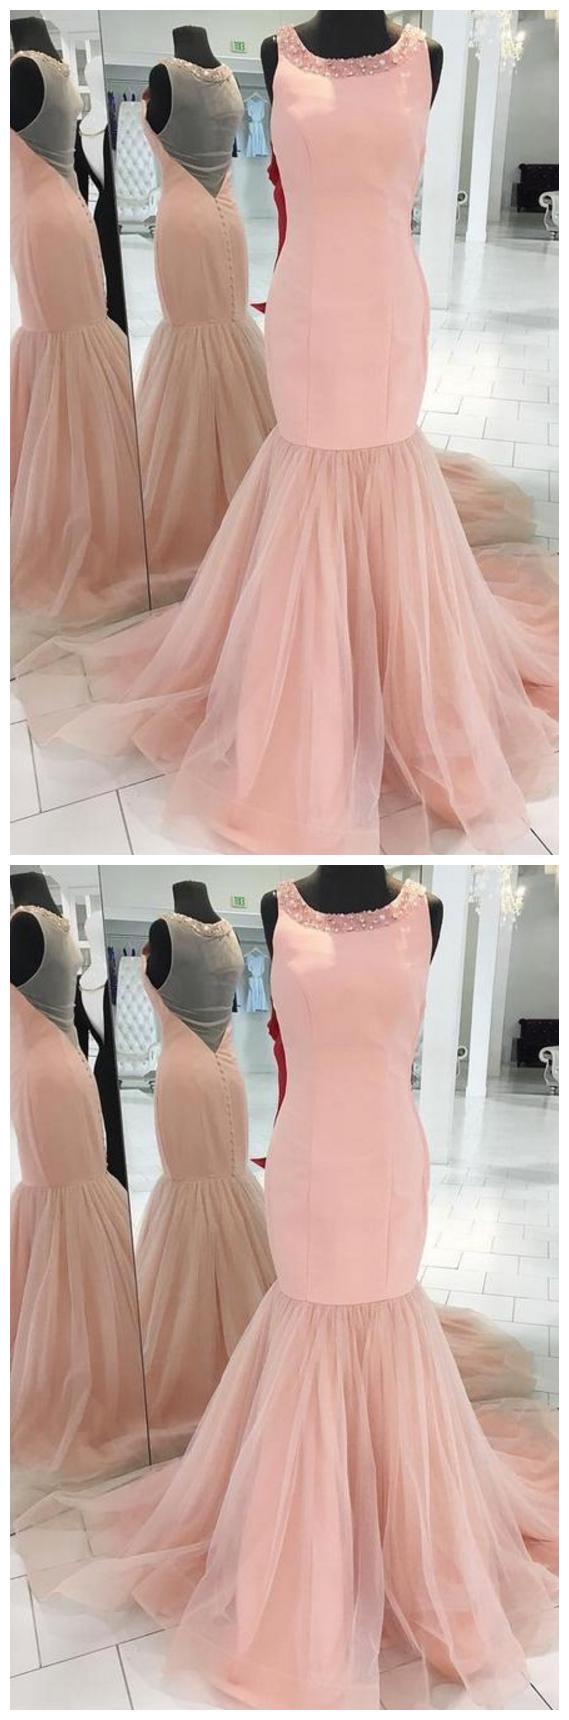 Prom Dresses,Mermaid Evening Dress,Modest Prom Dress